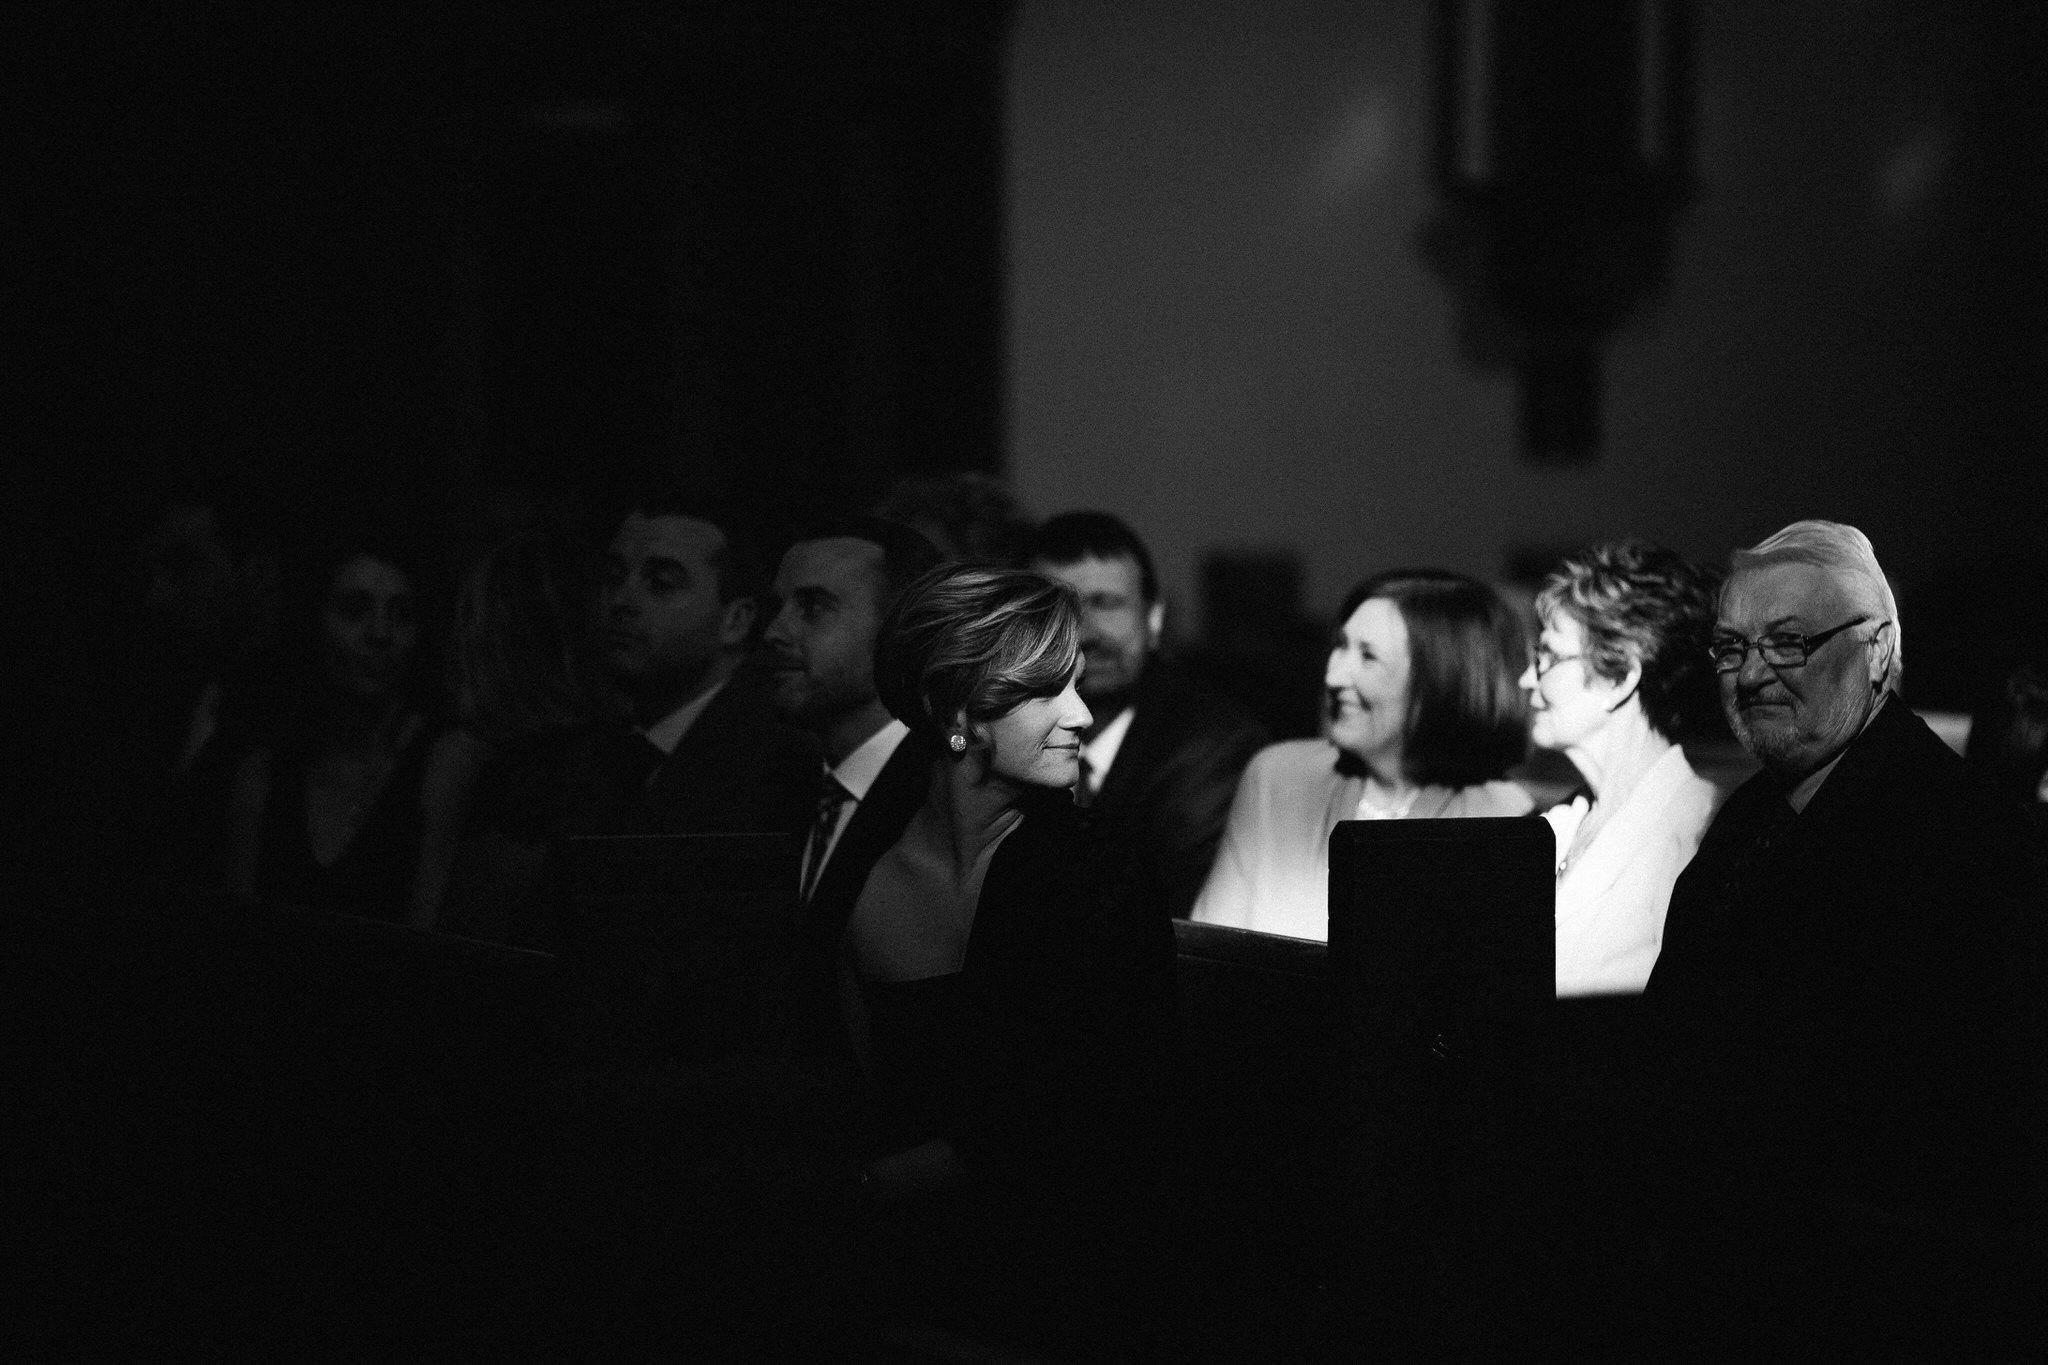 Blessed sacrament parish toronto, toronto wedding, church wedding, wedding photographer toronto, berkeley church wedding, wedding guests